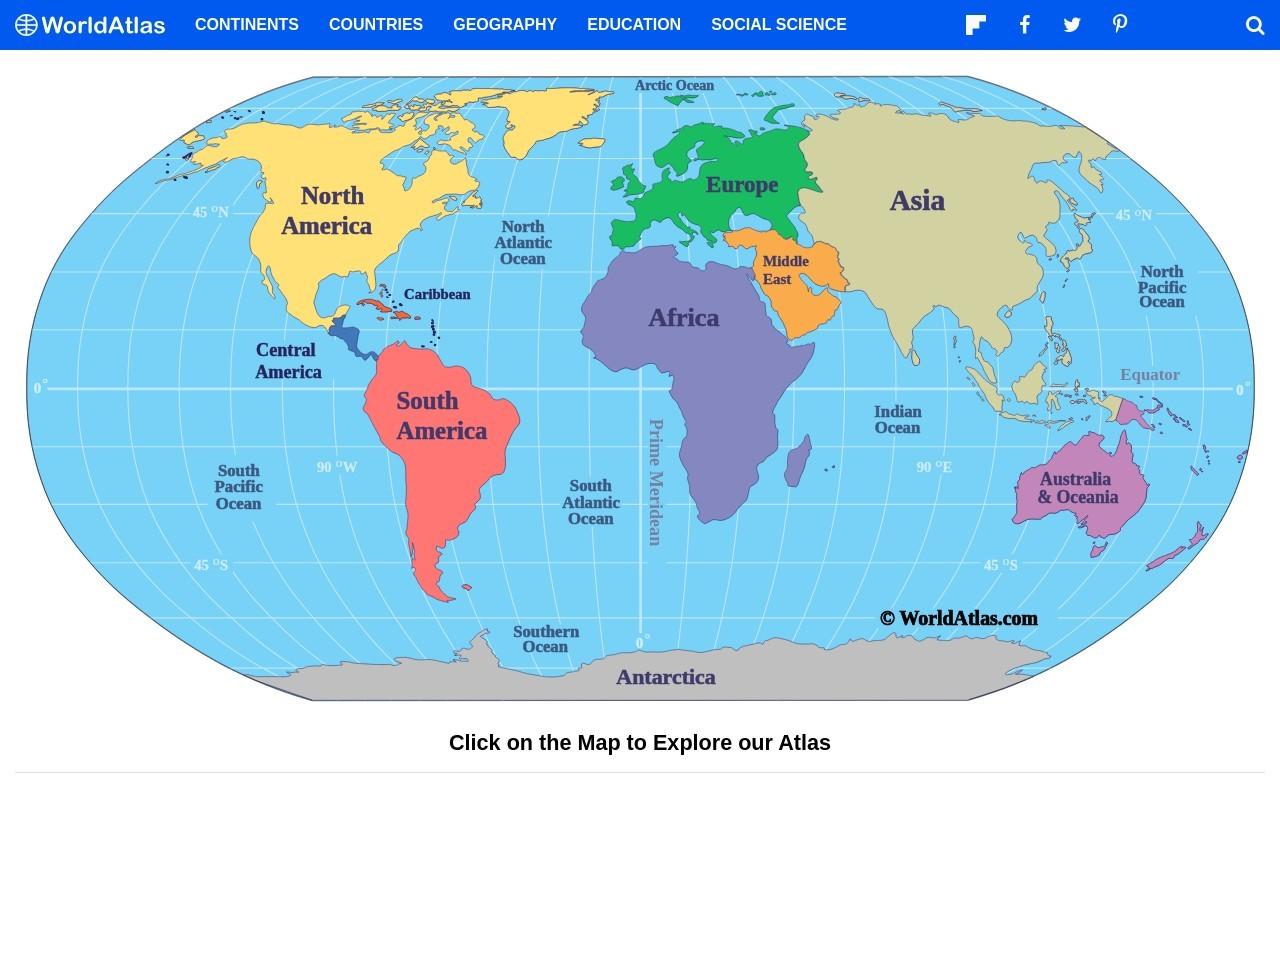 worldatlas.com